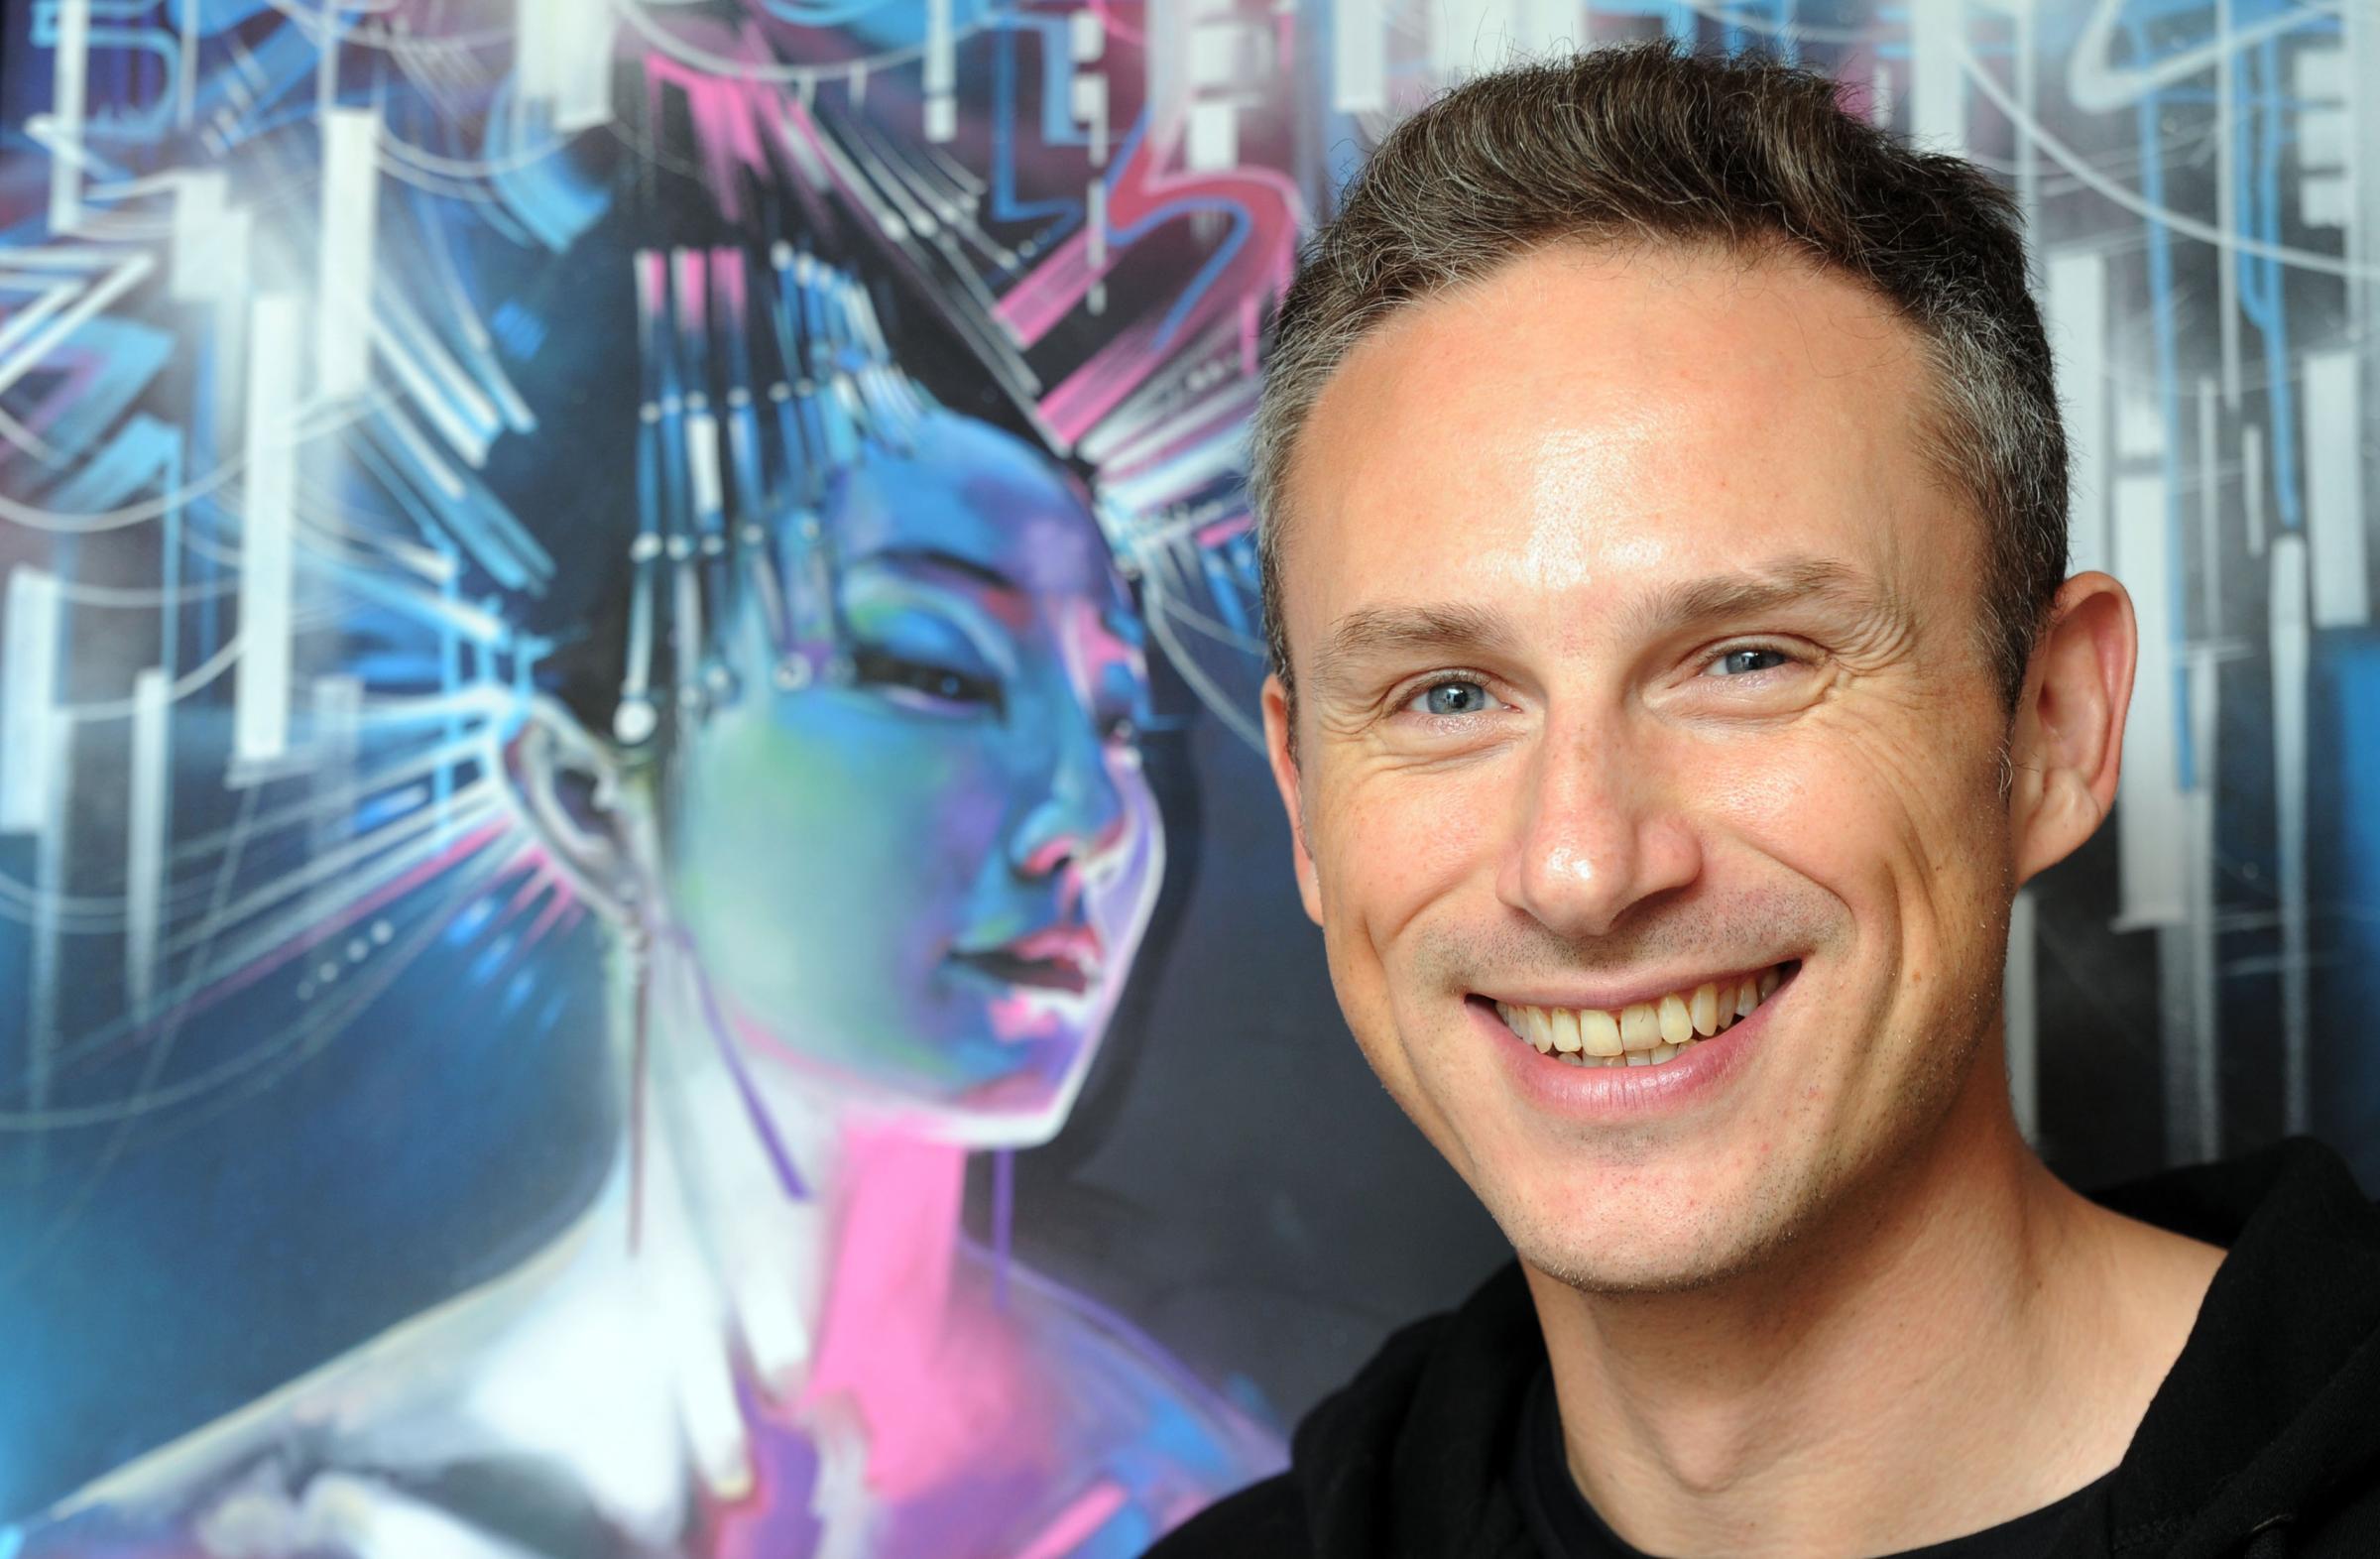 Artist Dan Kitchener aka DANK paints huge mural in Brick Lane called ...